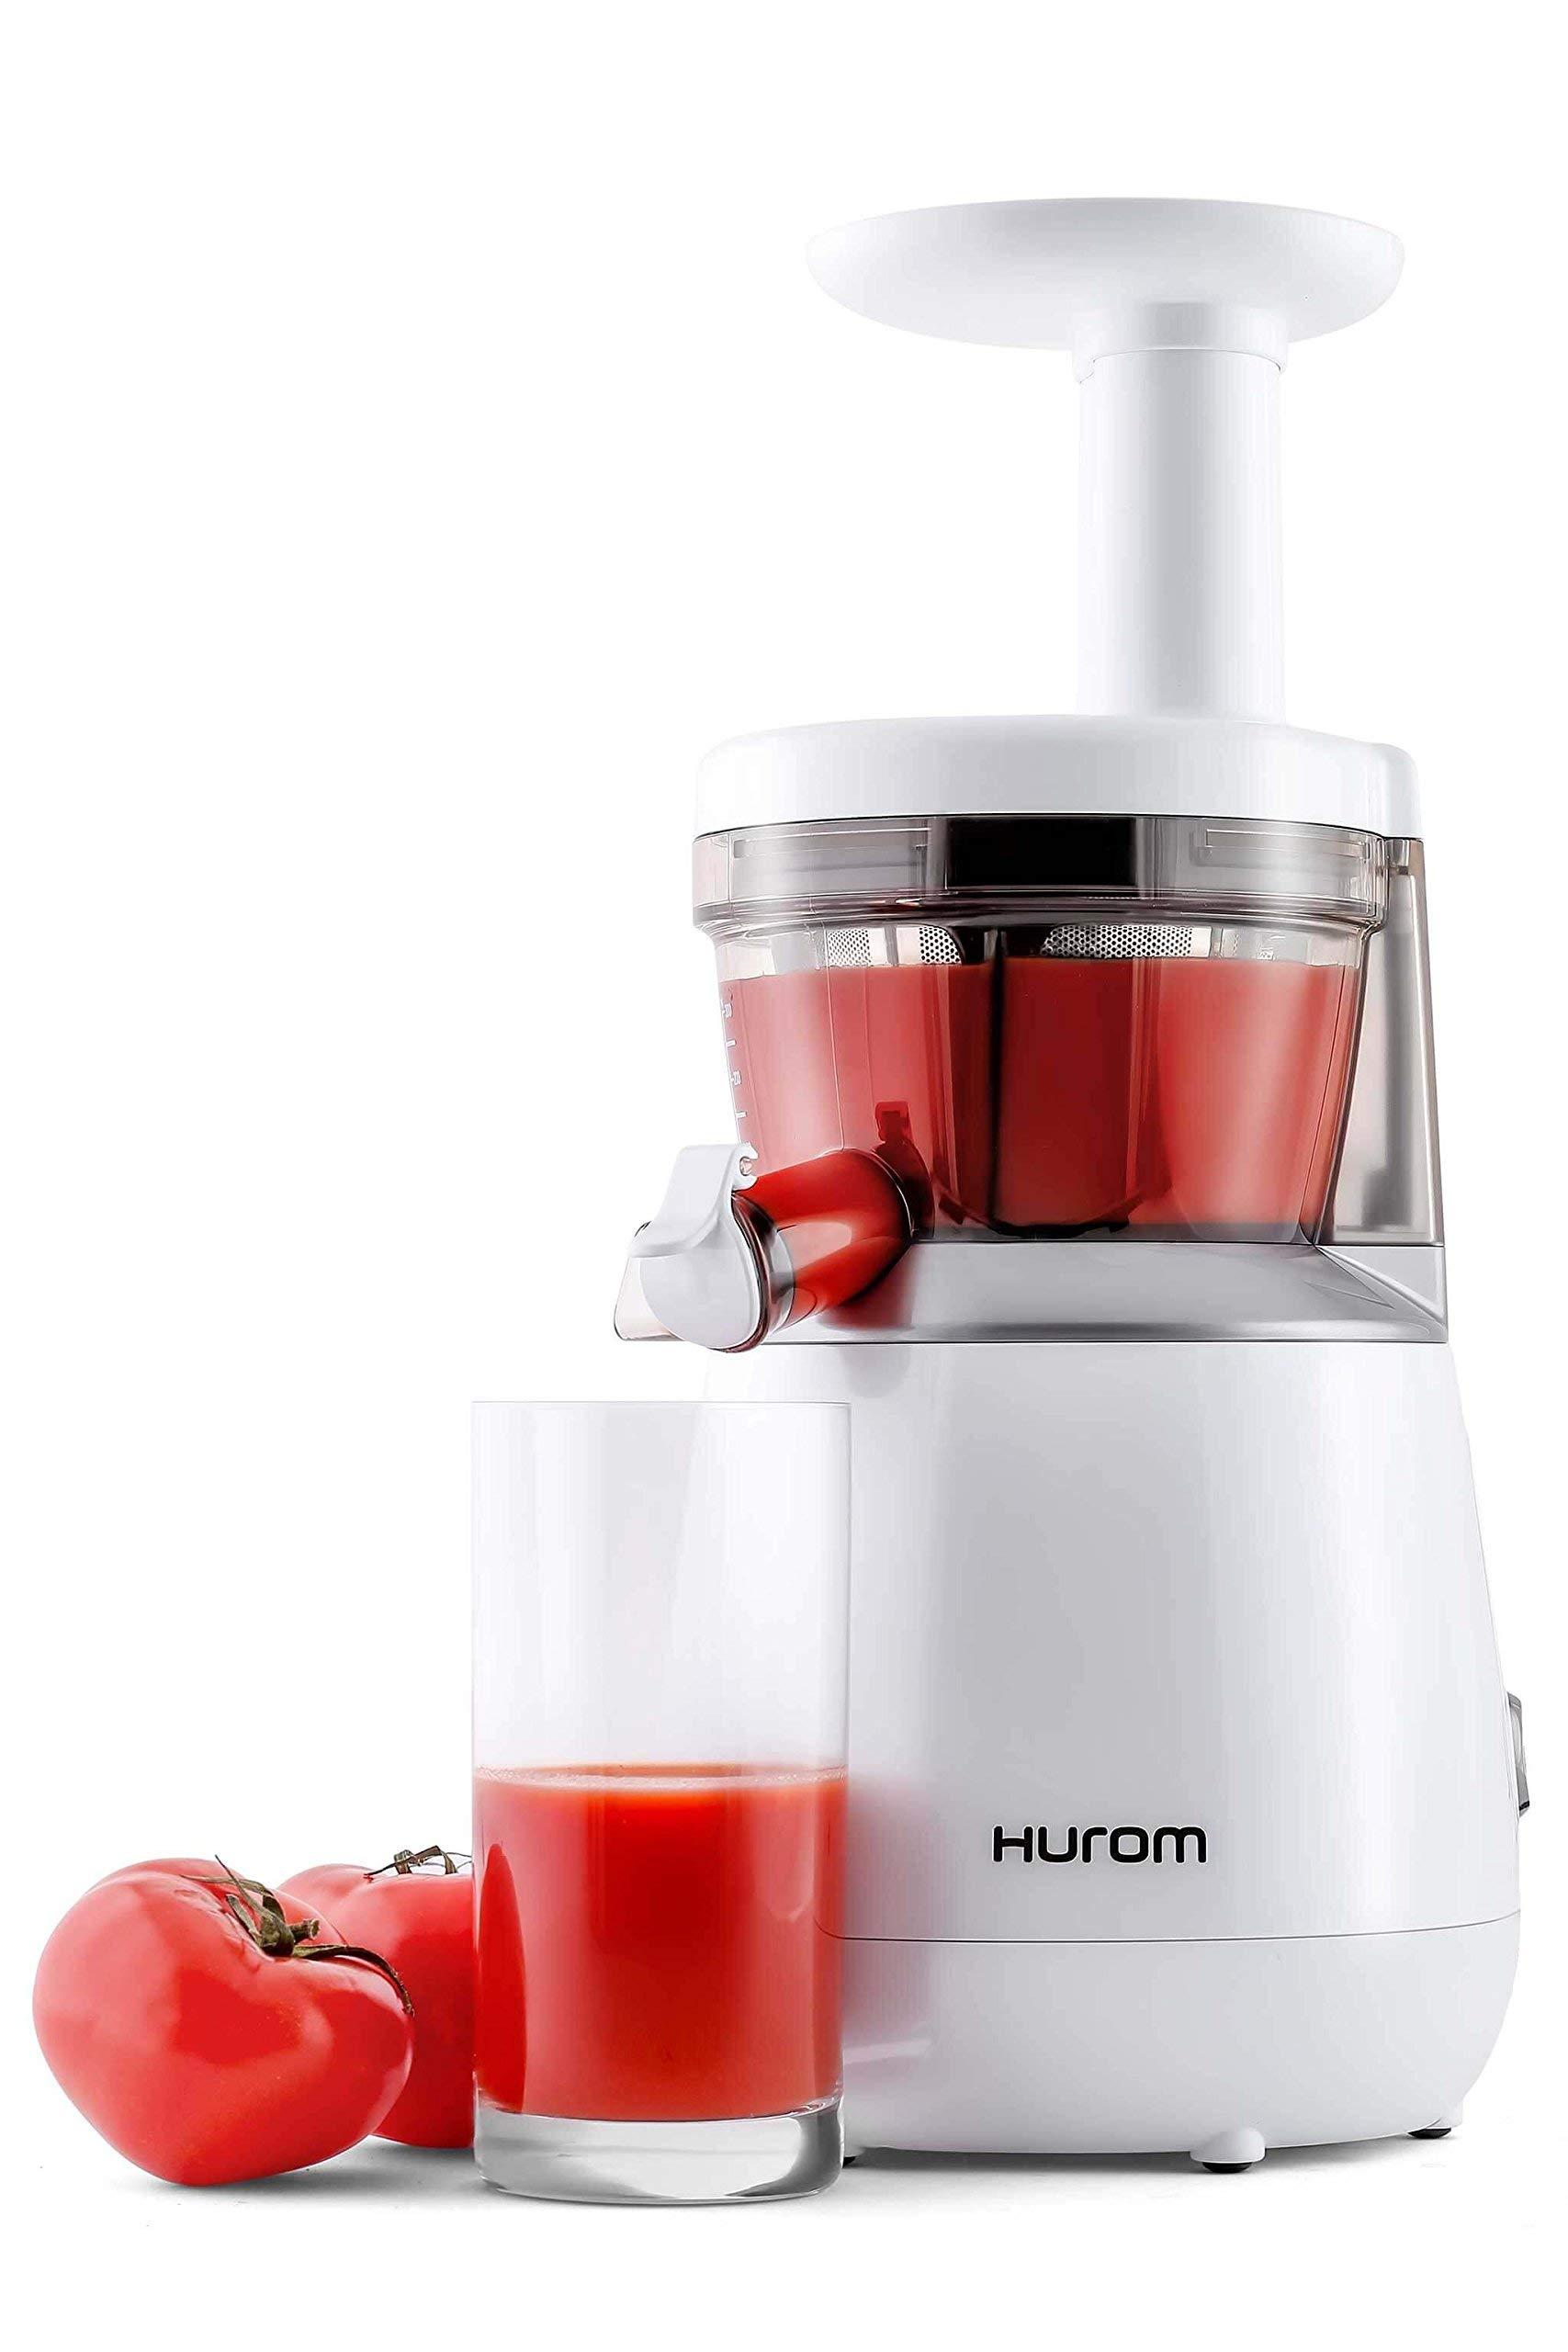 Hurom HP Slow Juicer, White (Renewed) by Hurom